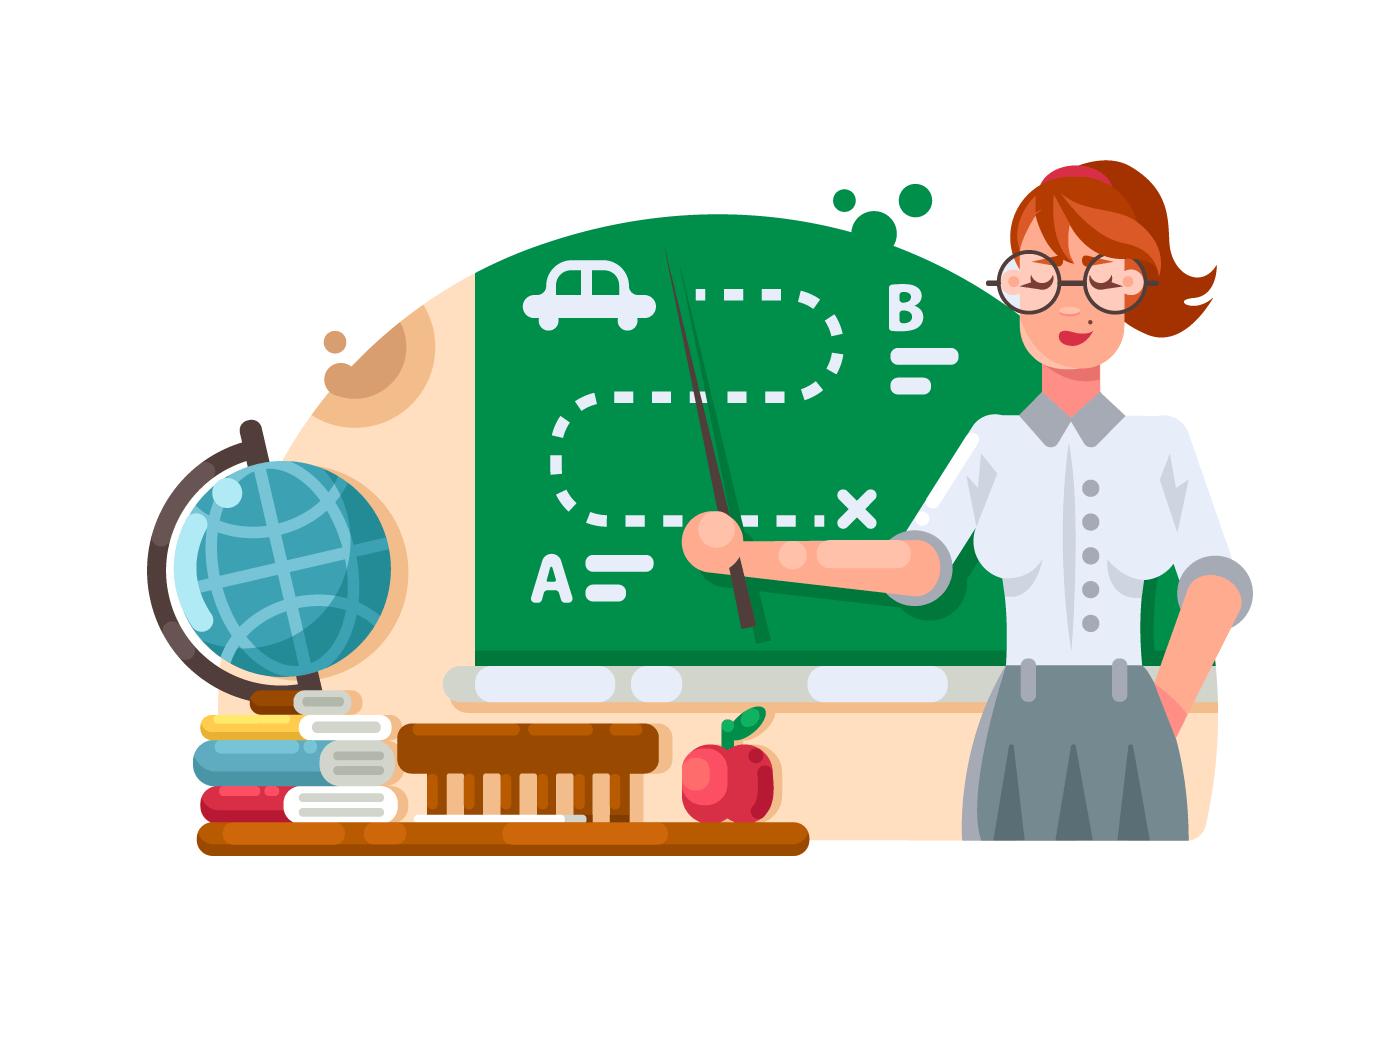 School teacher stands near blackboard illustration